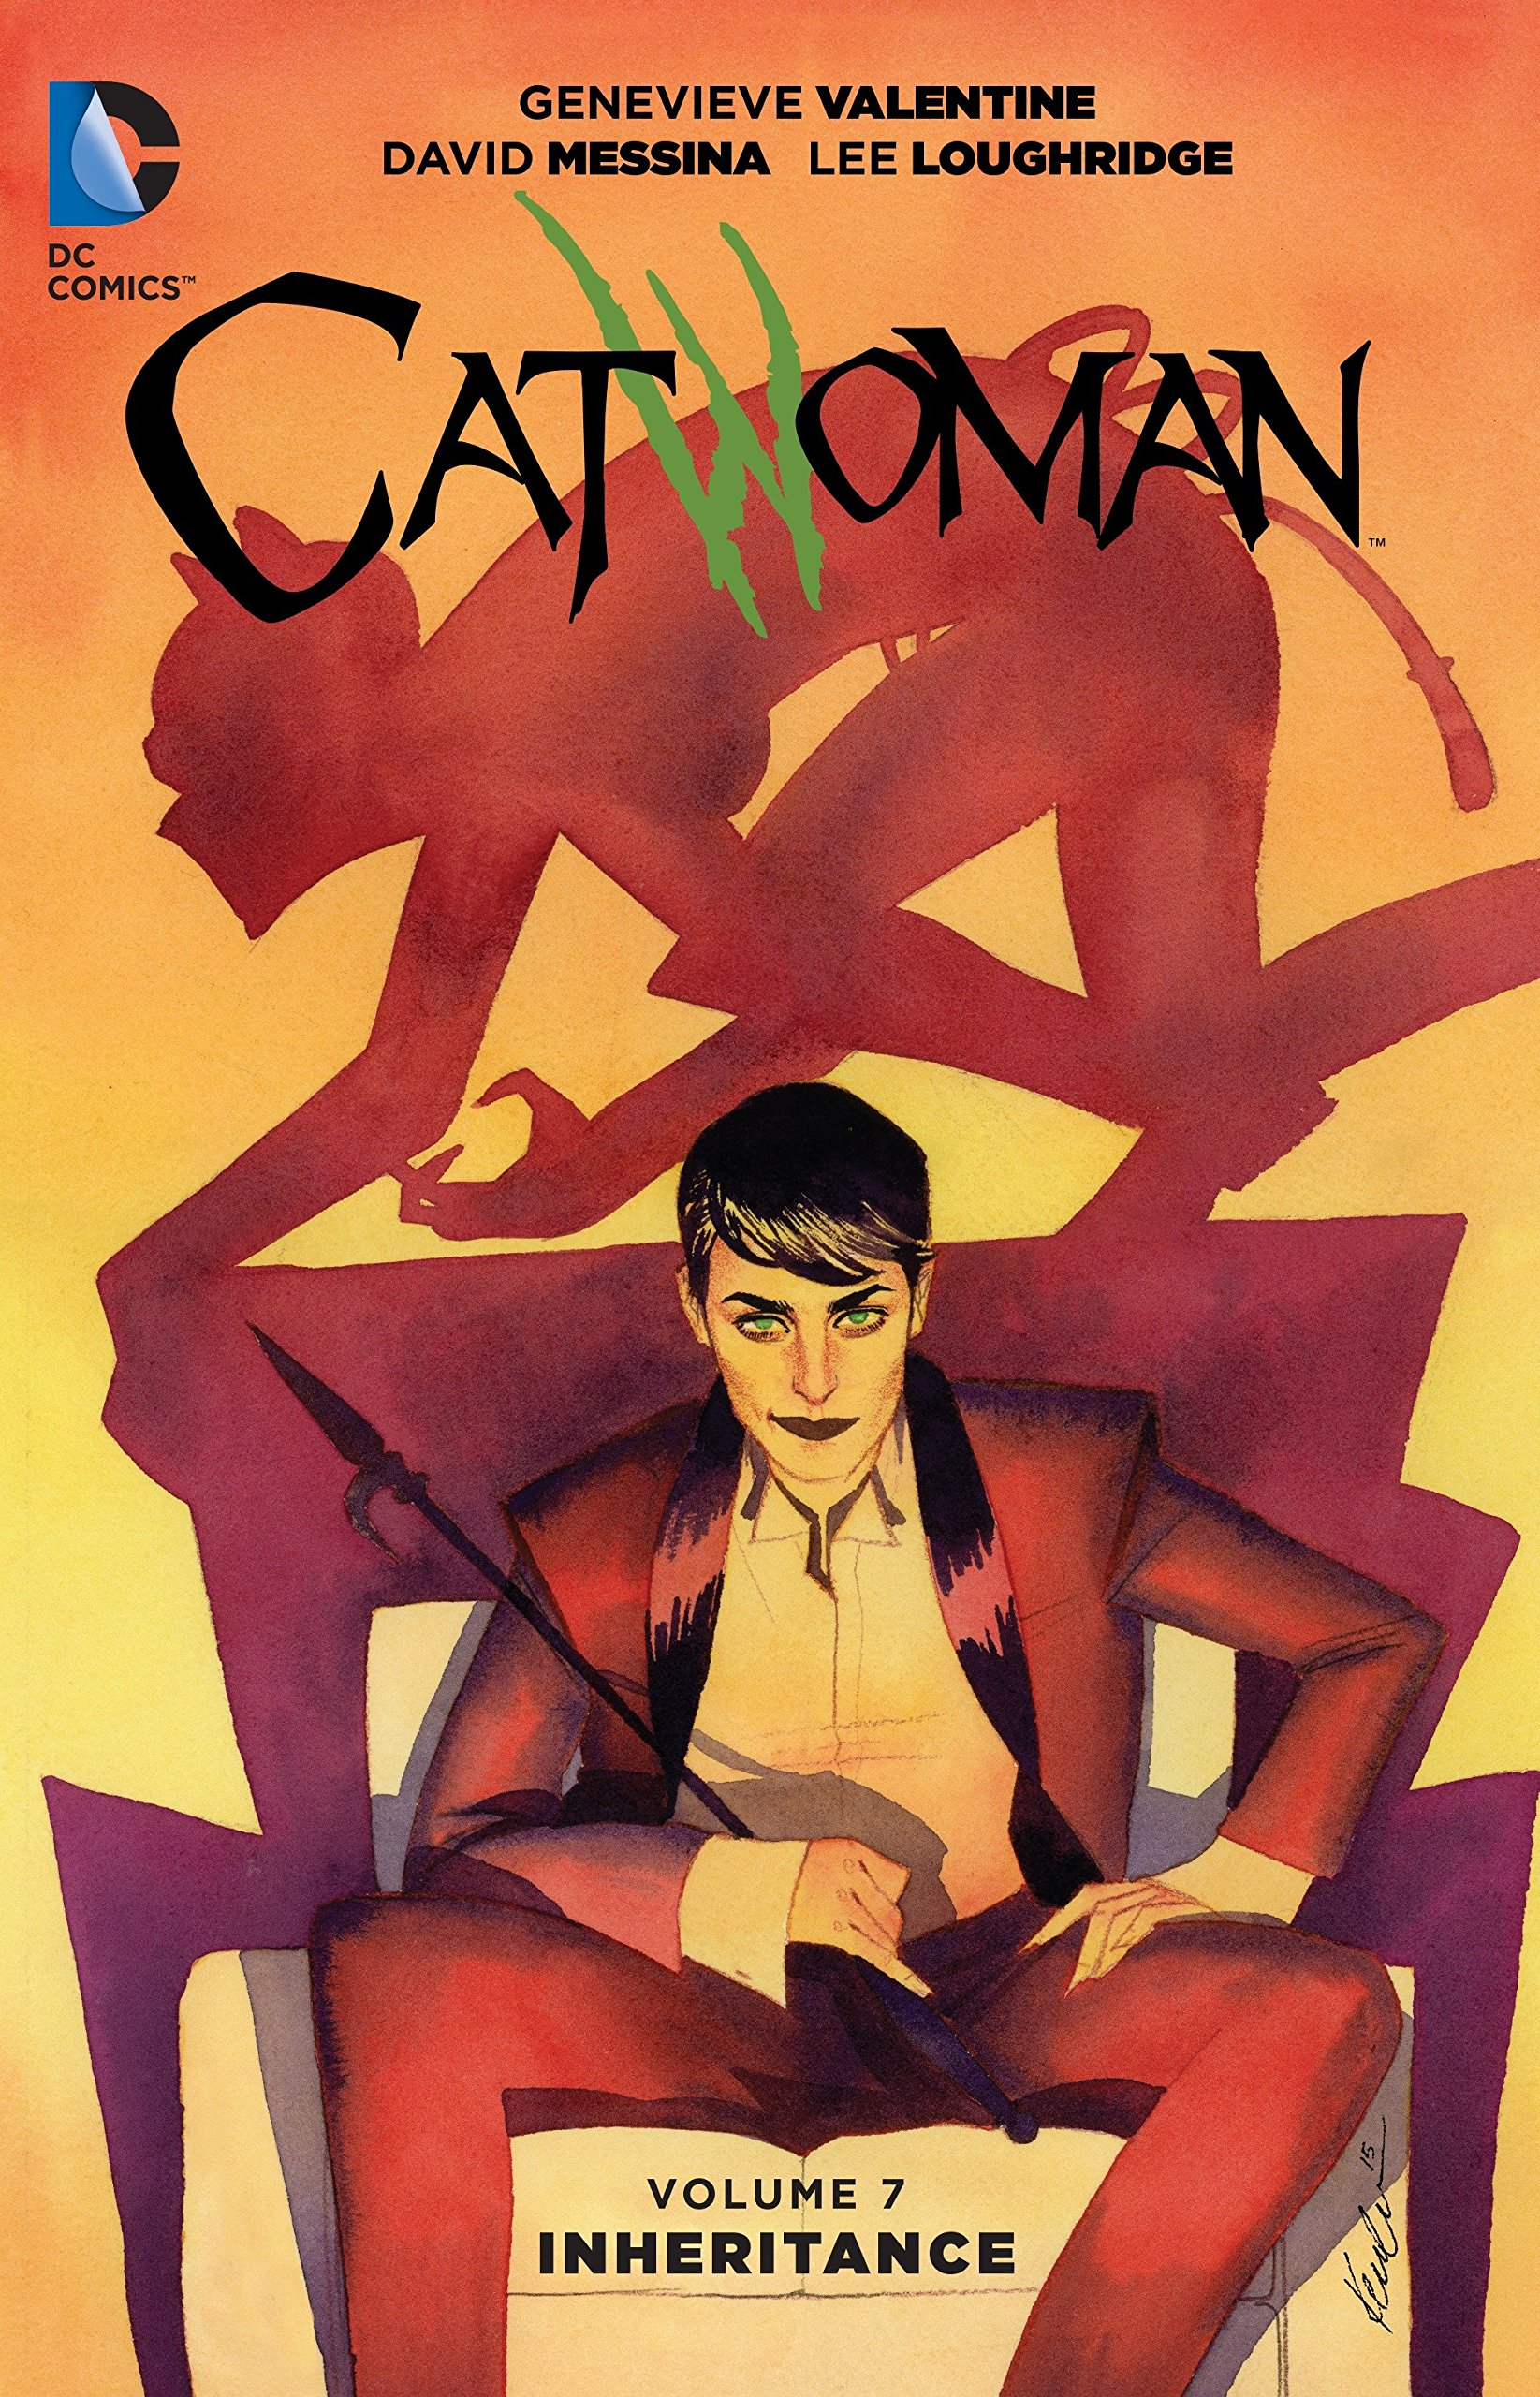 Catwoman Vol. 7: Inheritance pdf